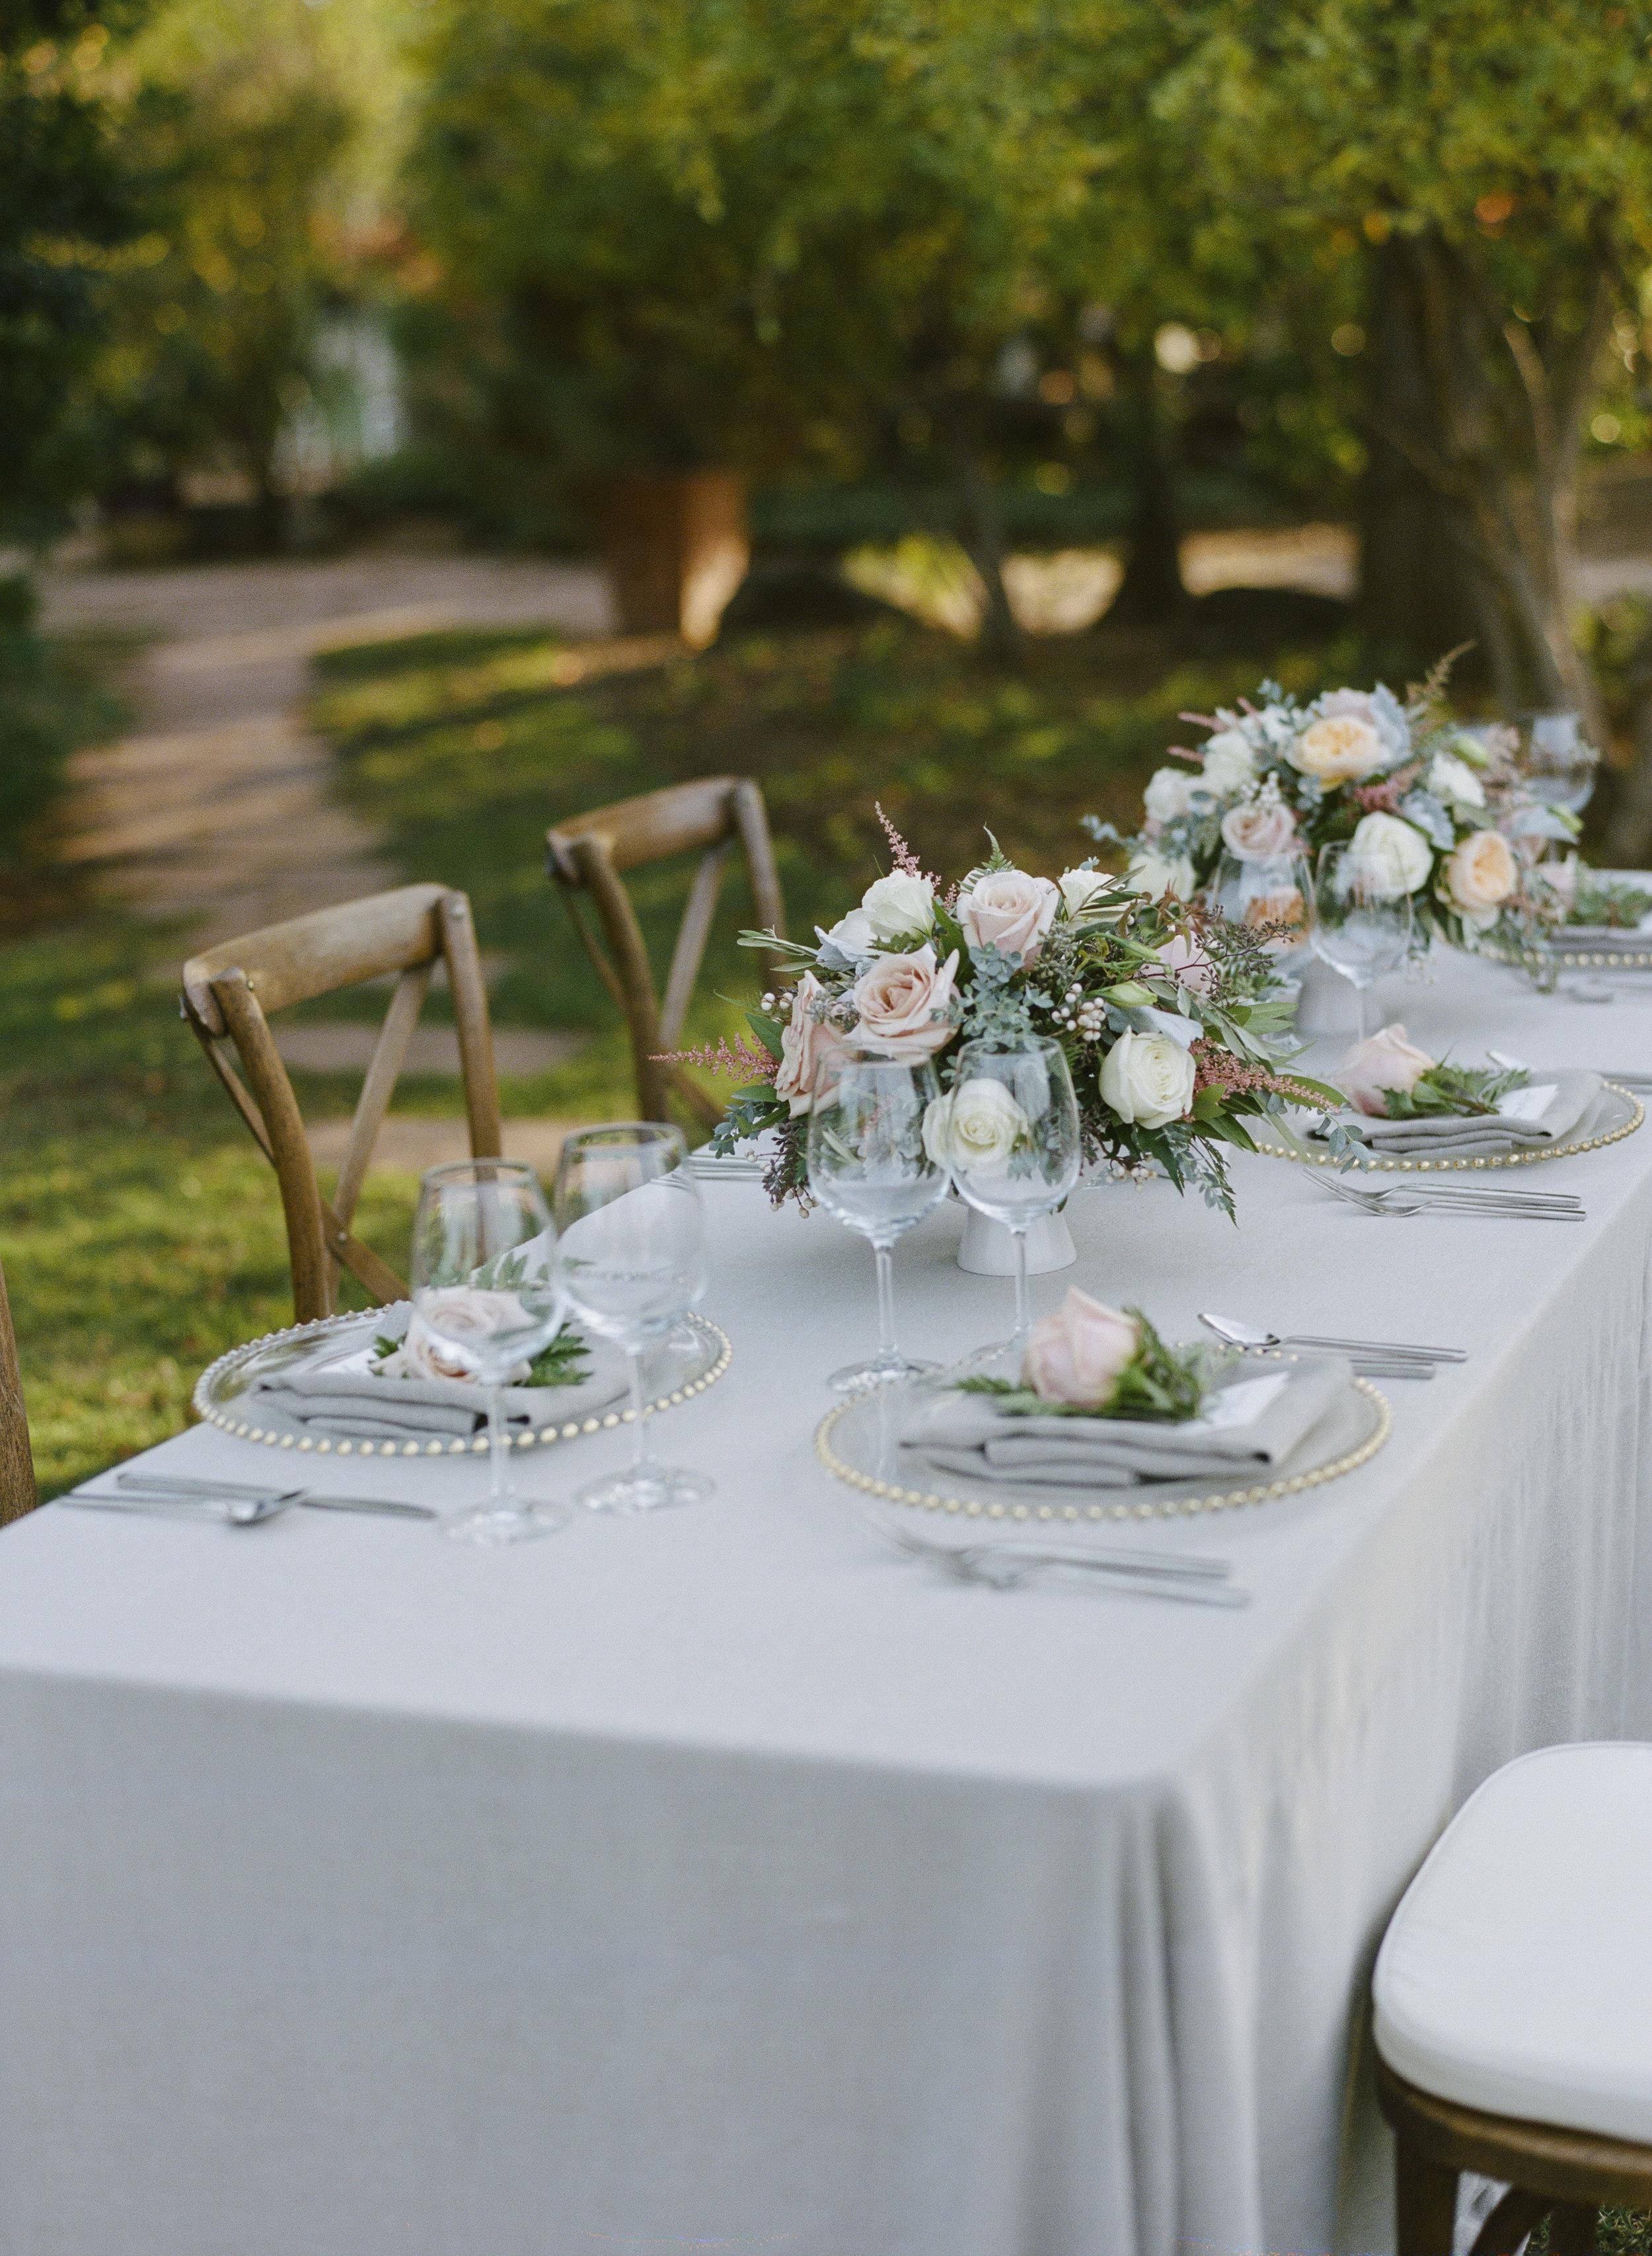 Violette-fleurs-roseville-sacramento-california-Flower-farm-inn-wedding-florist-spring-tablescape-blush-peach-gray-sideview-sacramento.jpg